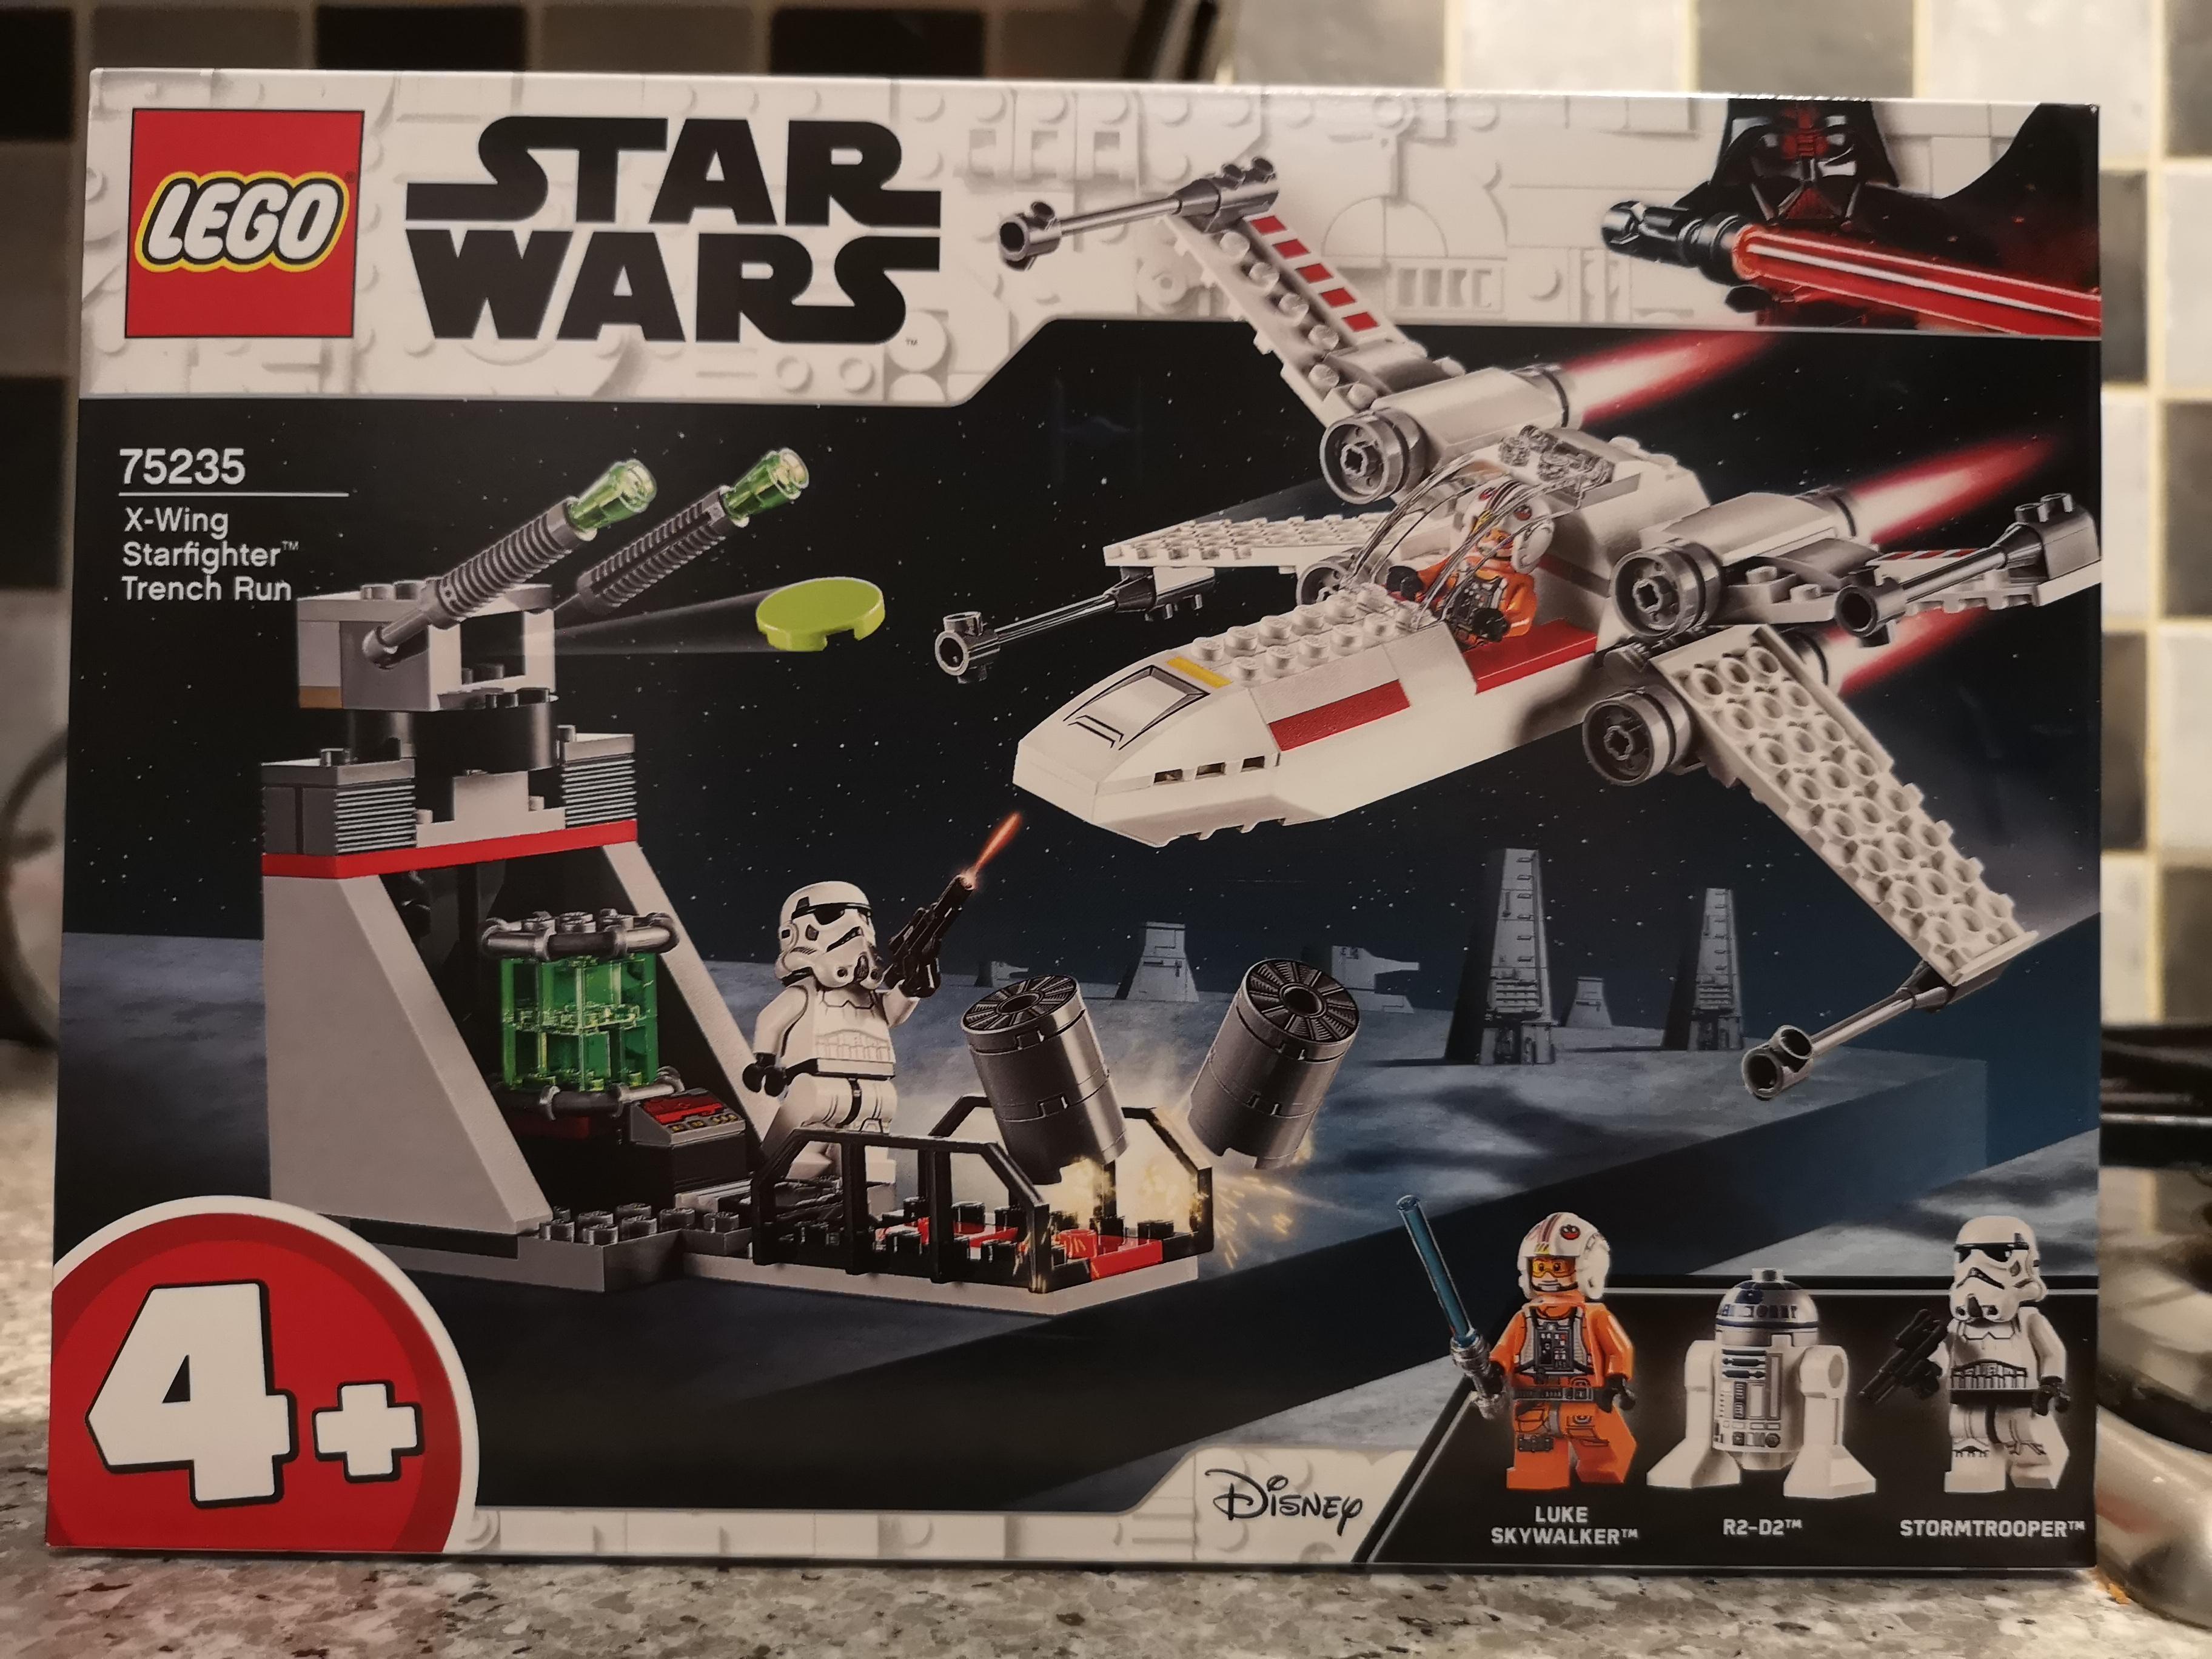 Lego 75235 X wing starfighter trench run scanning at £2.40 @ Asda (Hunts Cross)